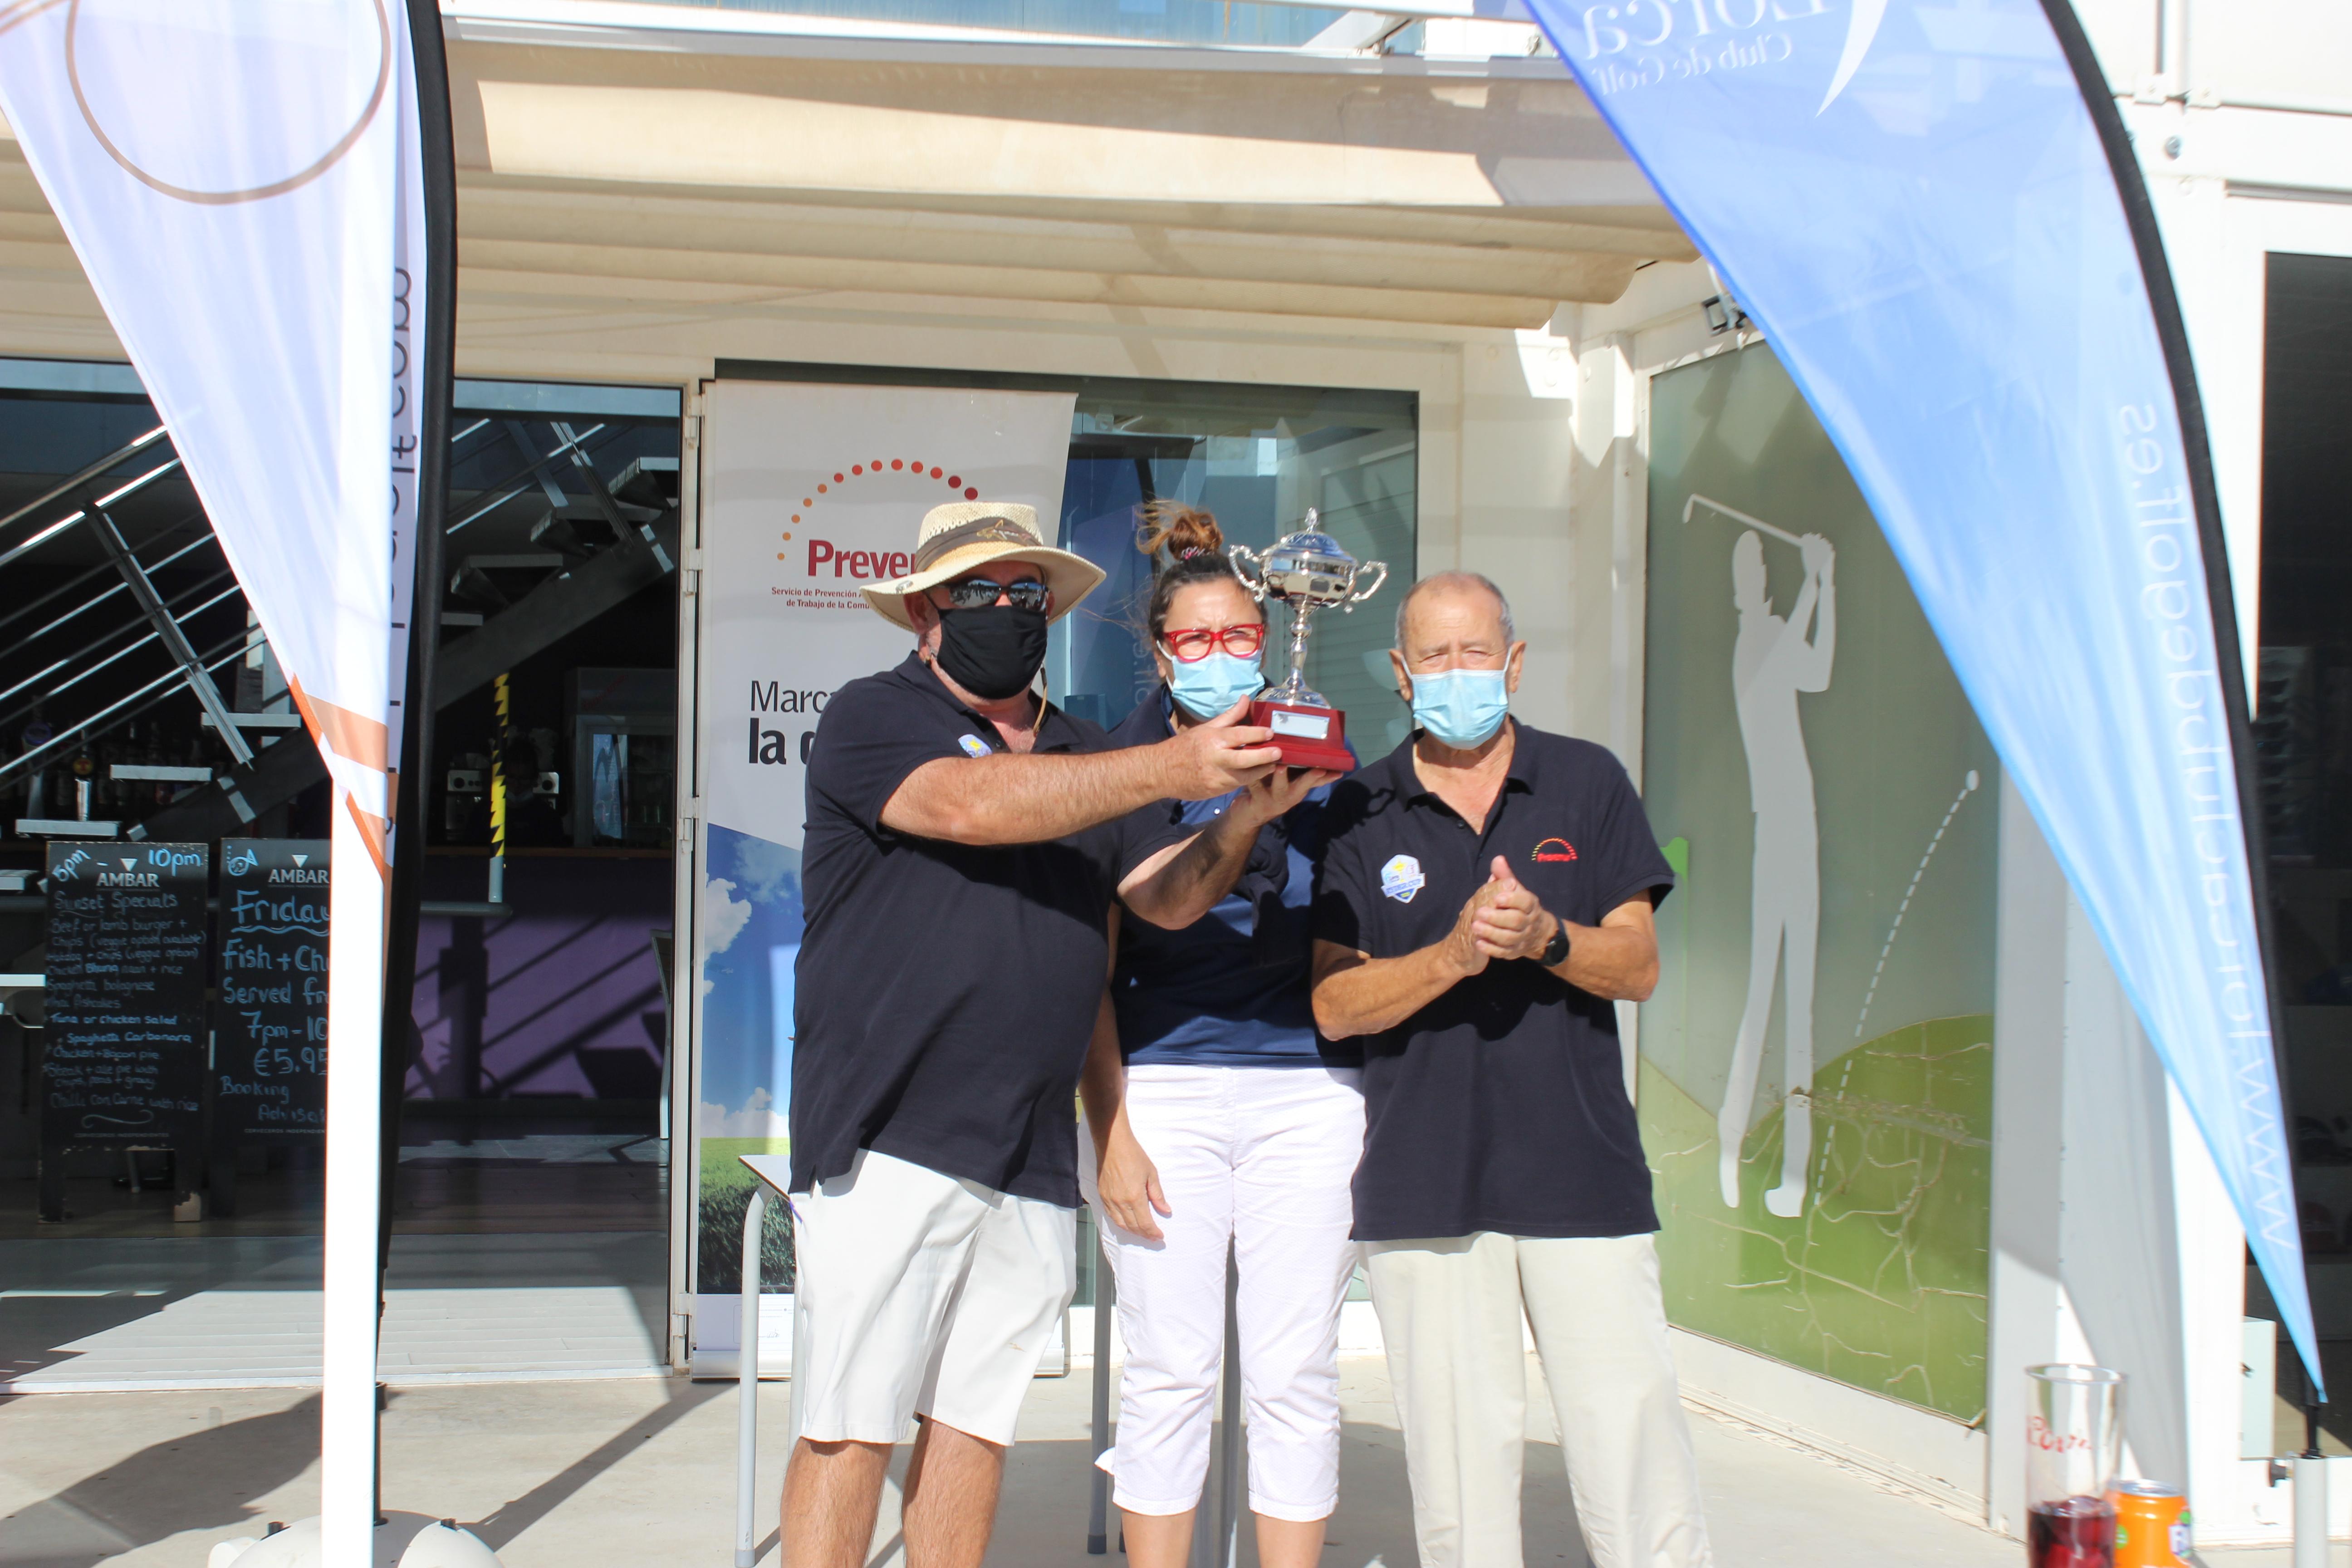 201004 ALH, Entrega del trofeo al capitán del Lorca Club de Golf